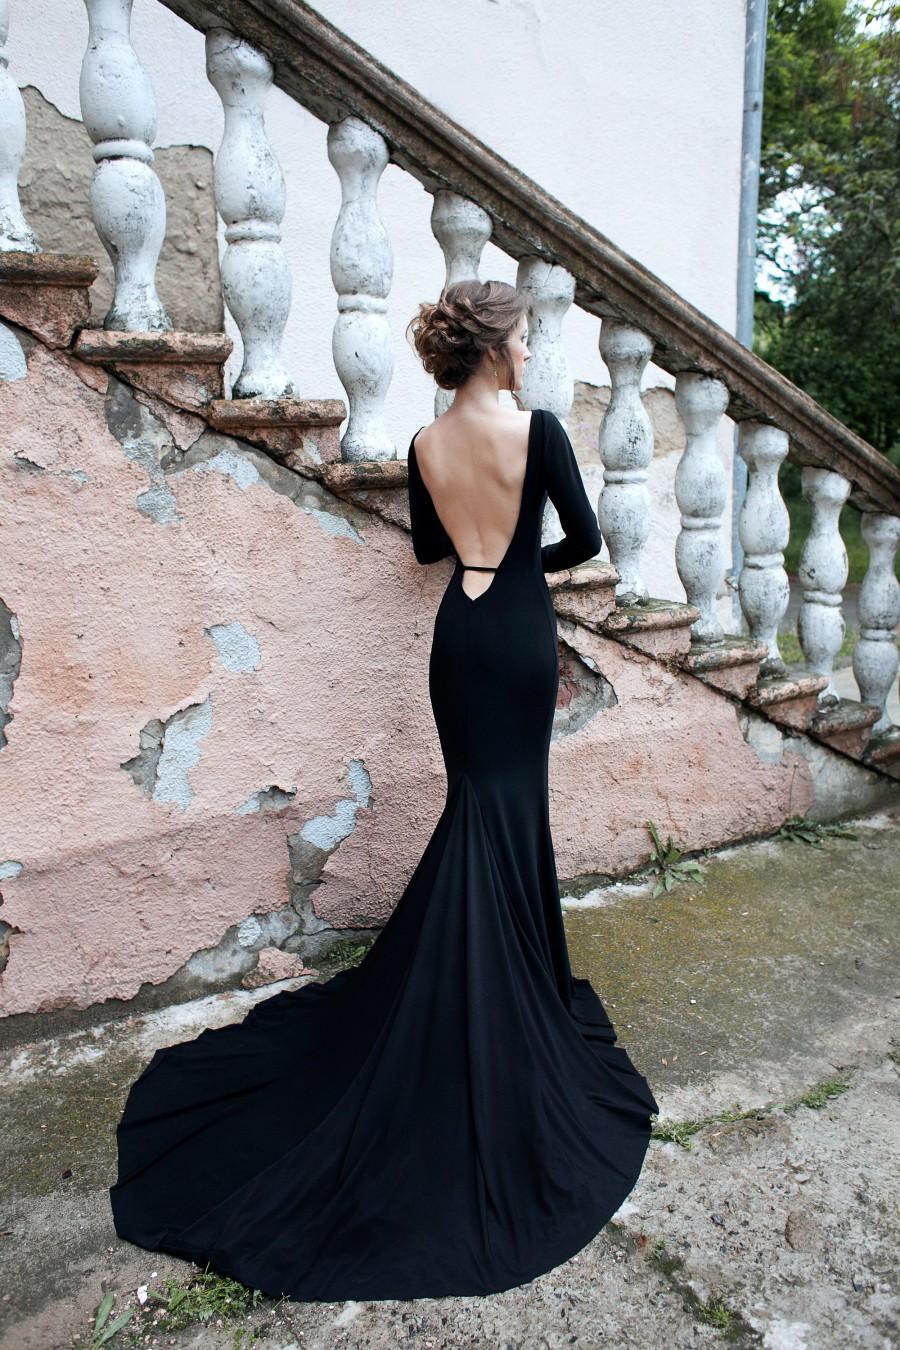 زفاف - Evening and wedding mimimalist simple dress, Bridesmaid dress with sleeve, long train